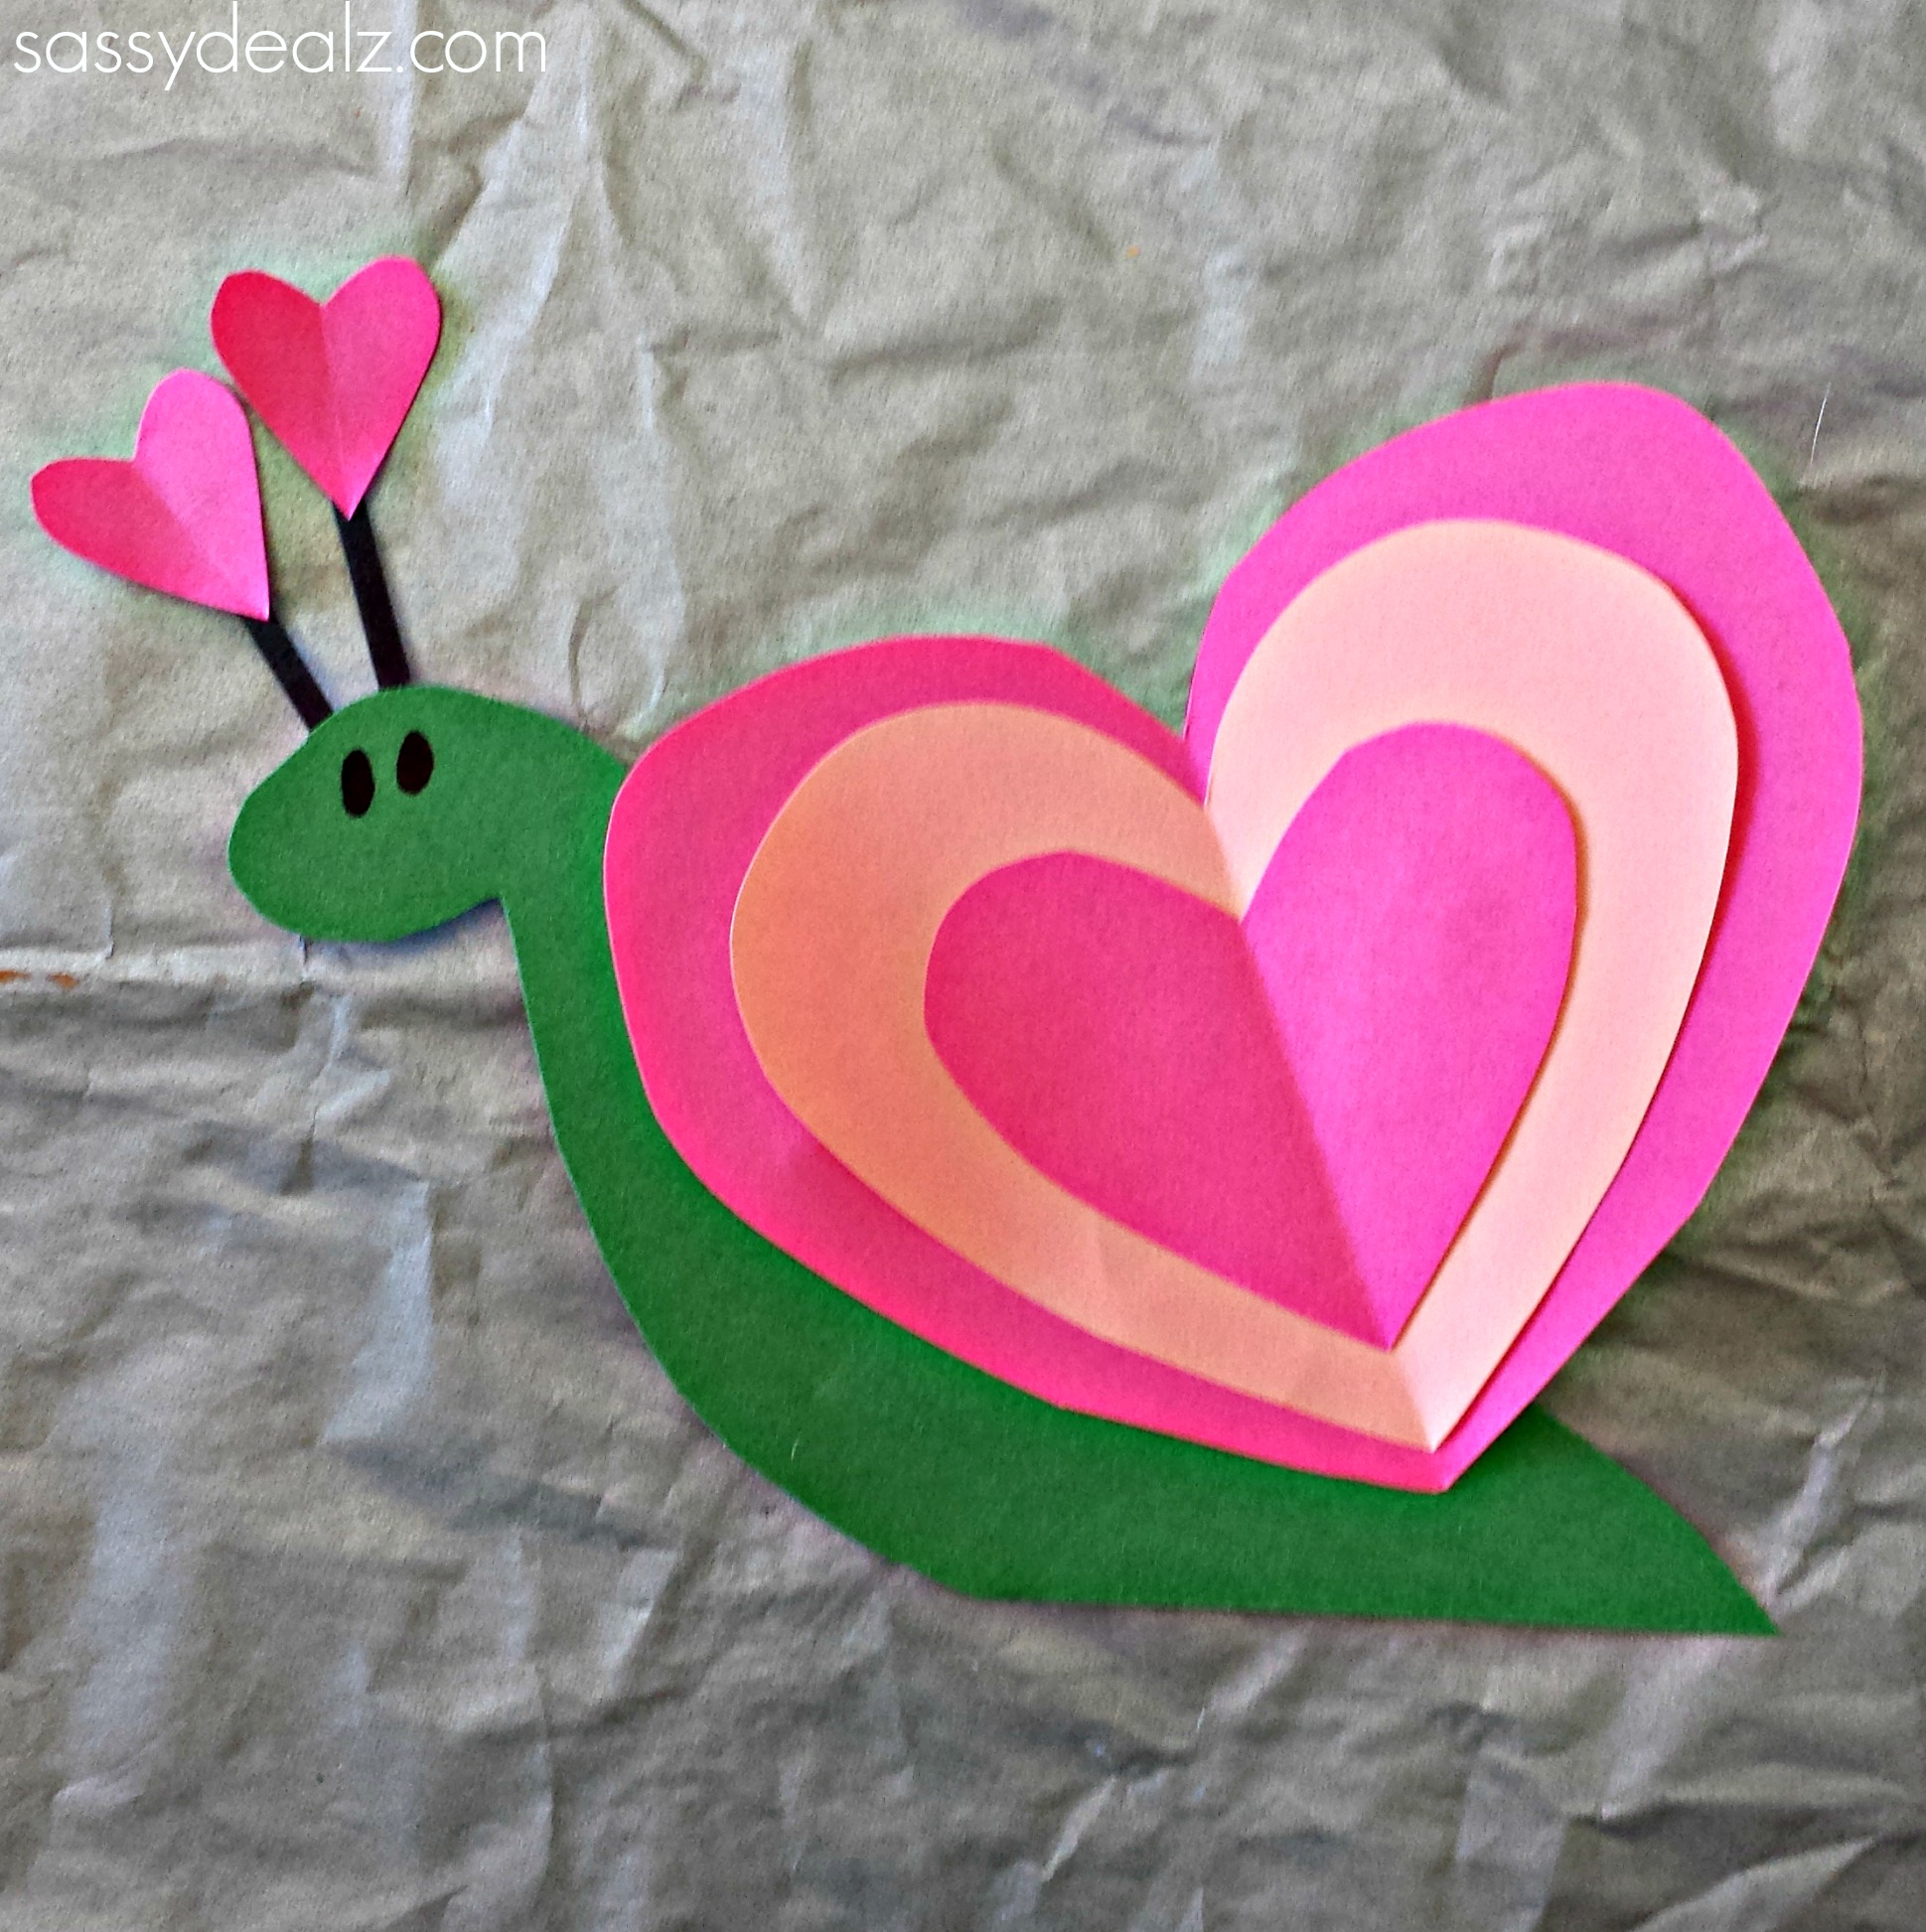 Heart snail craft for kids valentine art project for Valentines crafts for kids